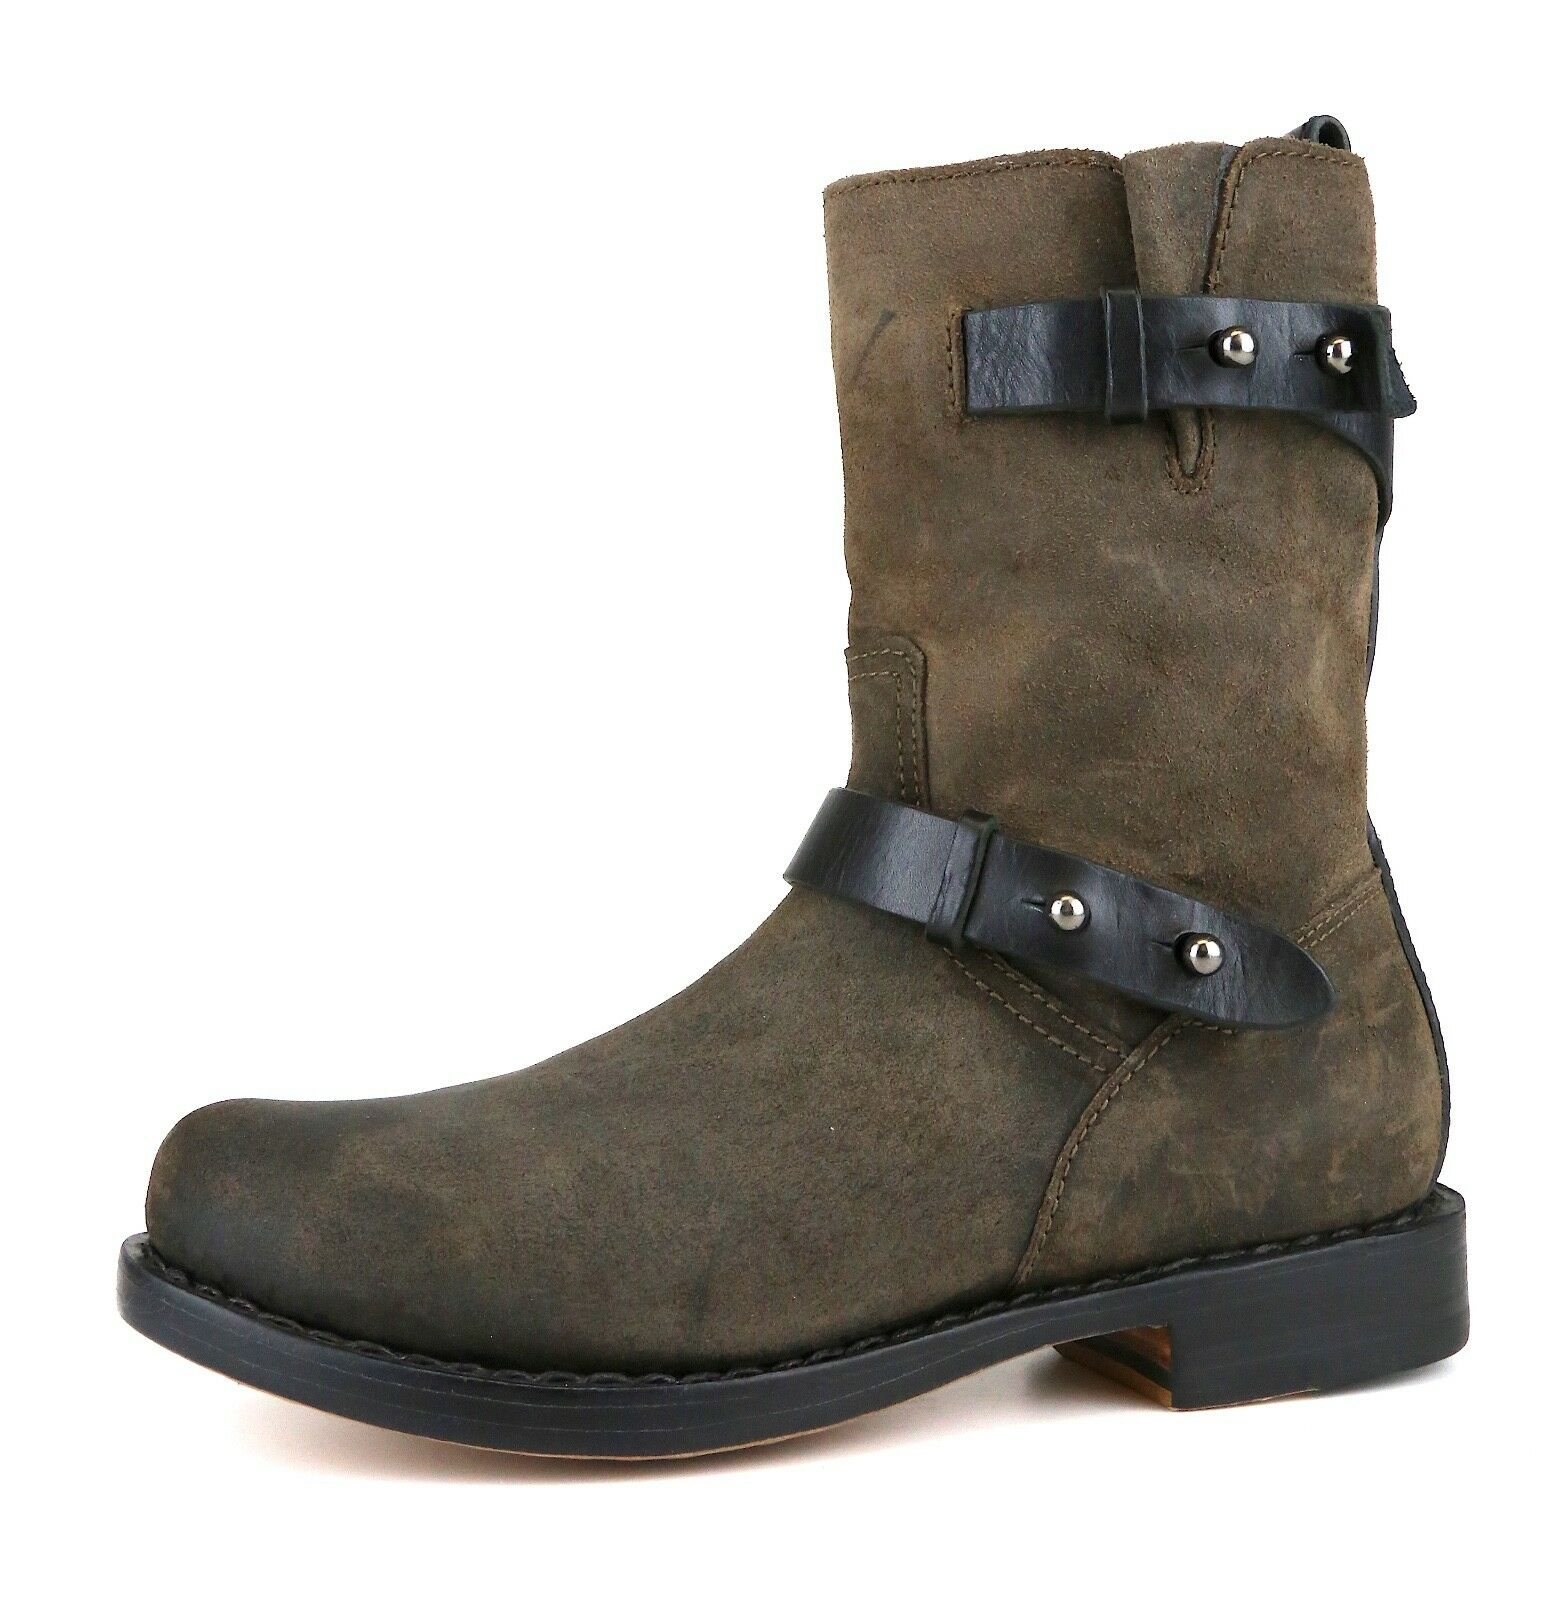 Rag & Bone Women's Brown Moto Waxed Calfskin Ankle Boots 5252 Sz 36.5 EUR